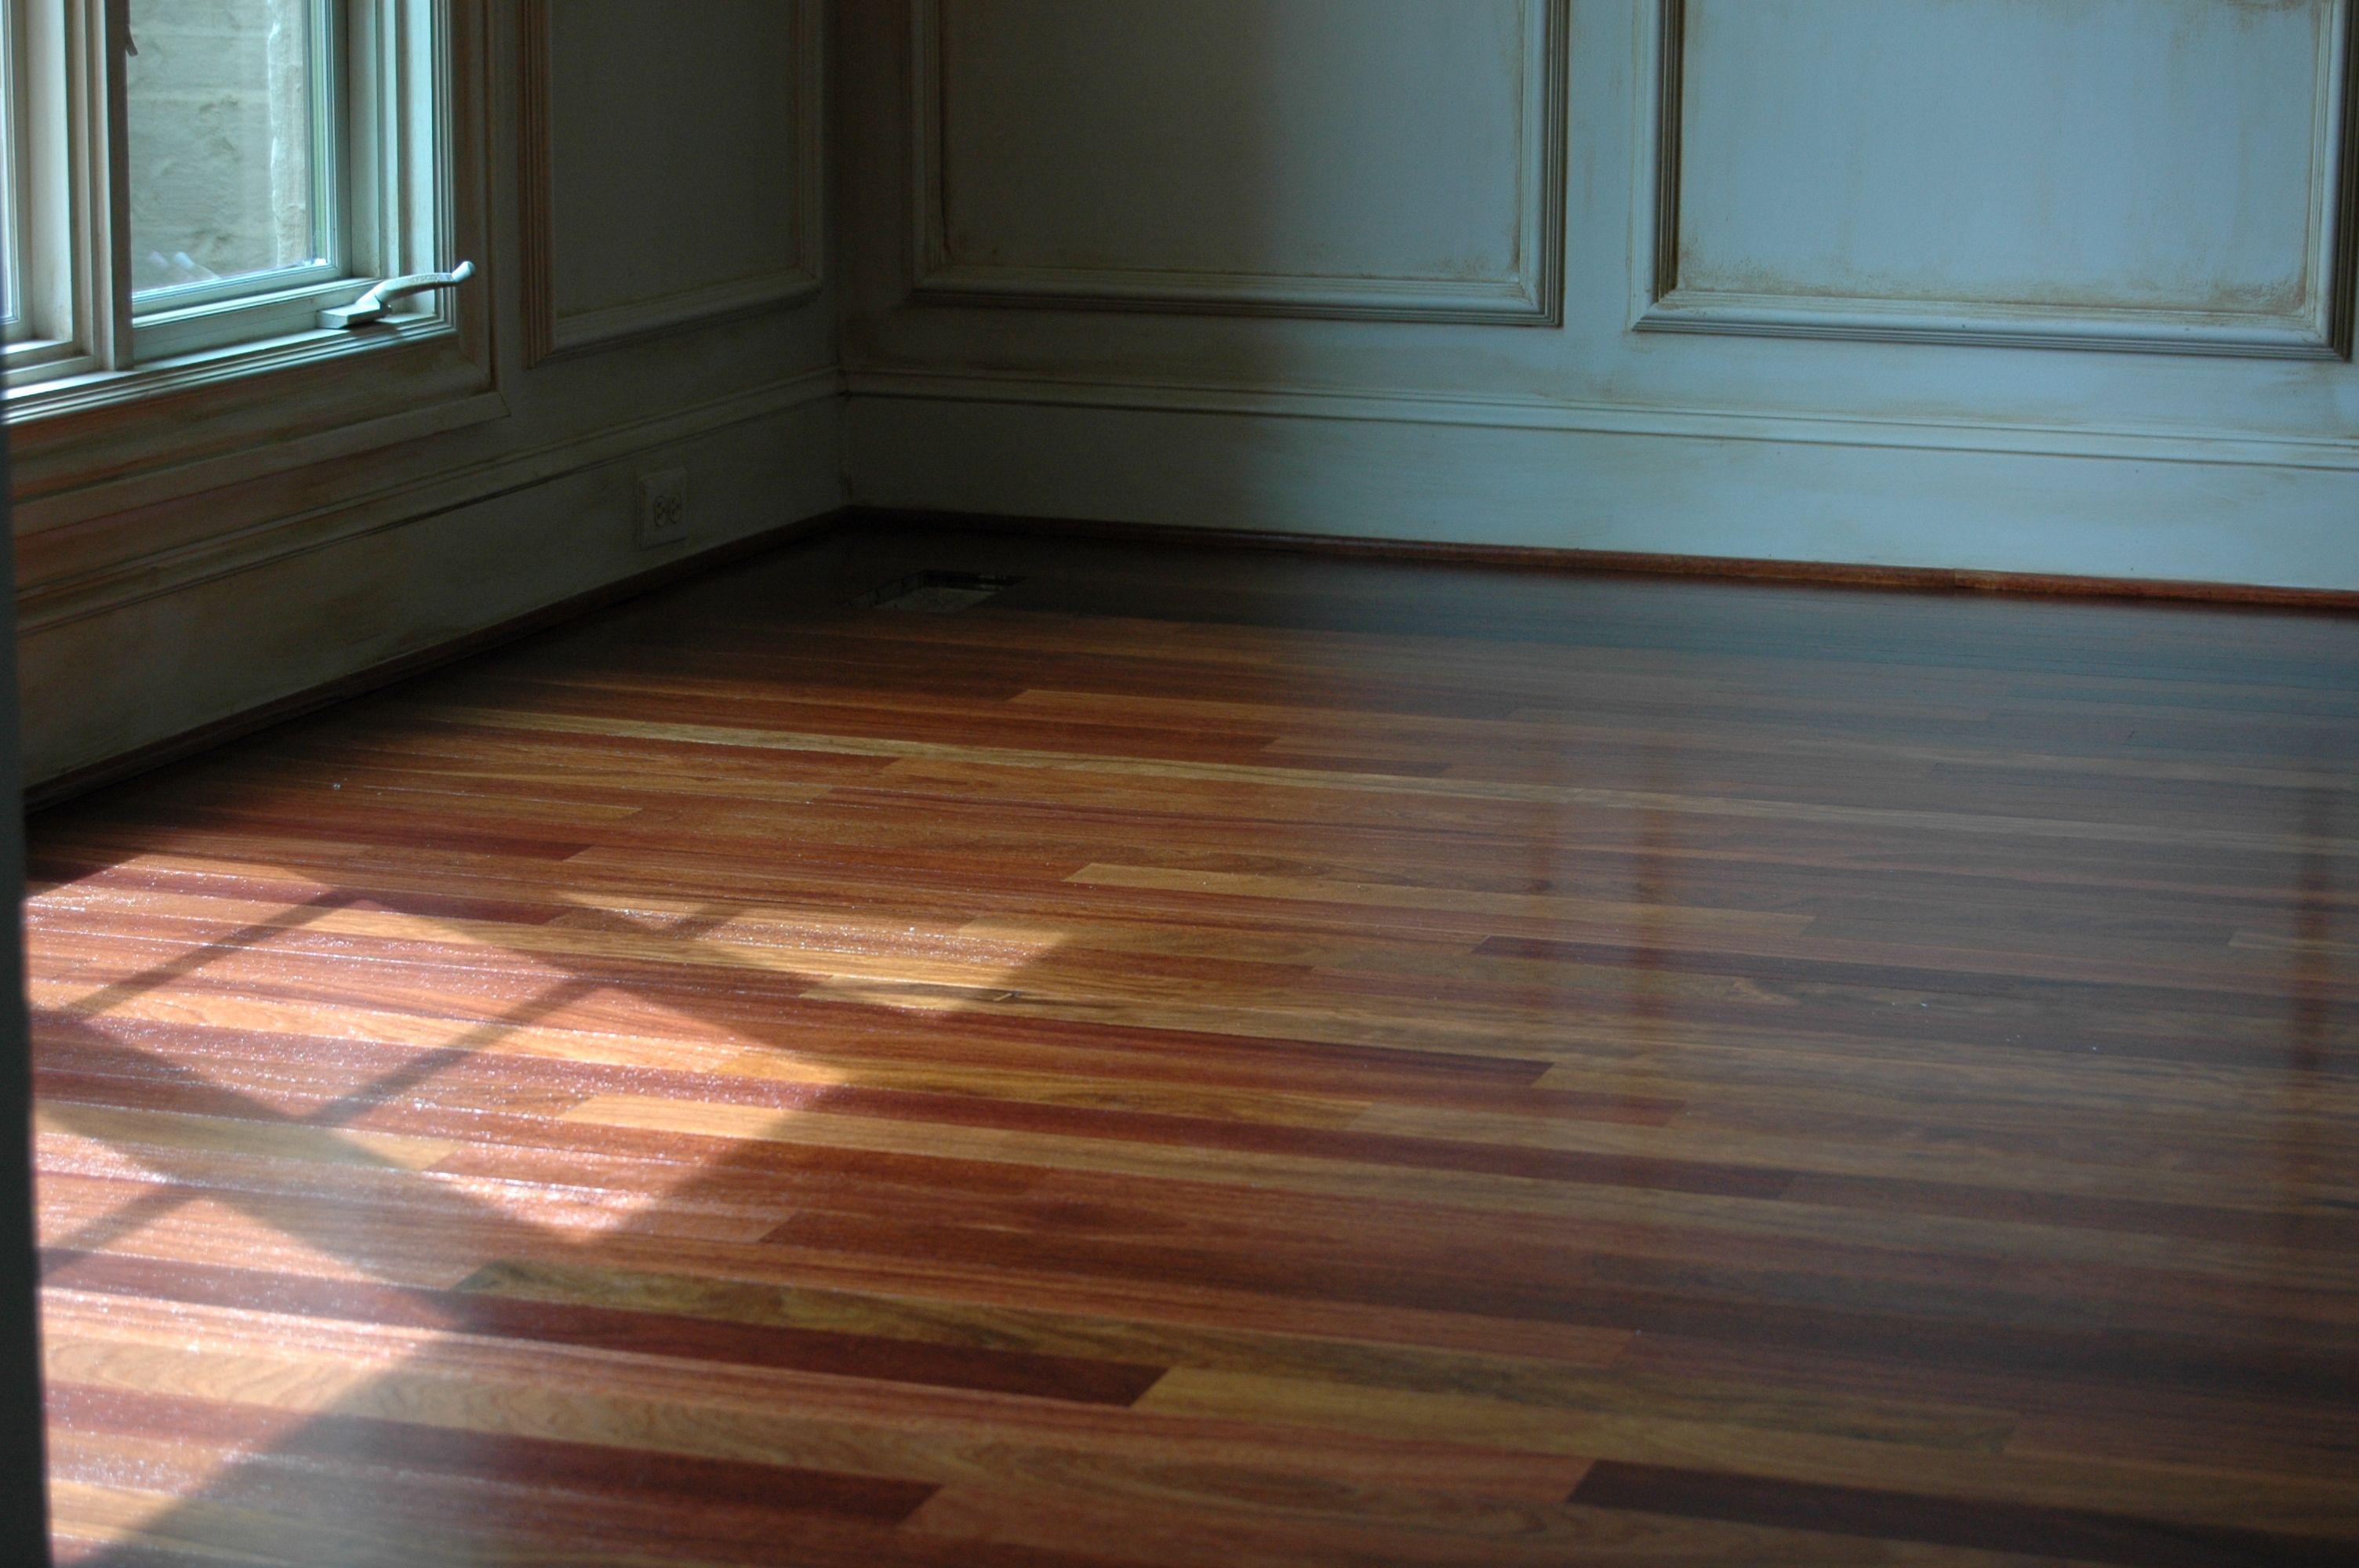 Hardwood floor finishes cherry with semi gloss finish q why hardwood floor  finishes cherry with semi